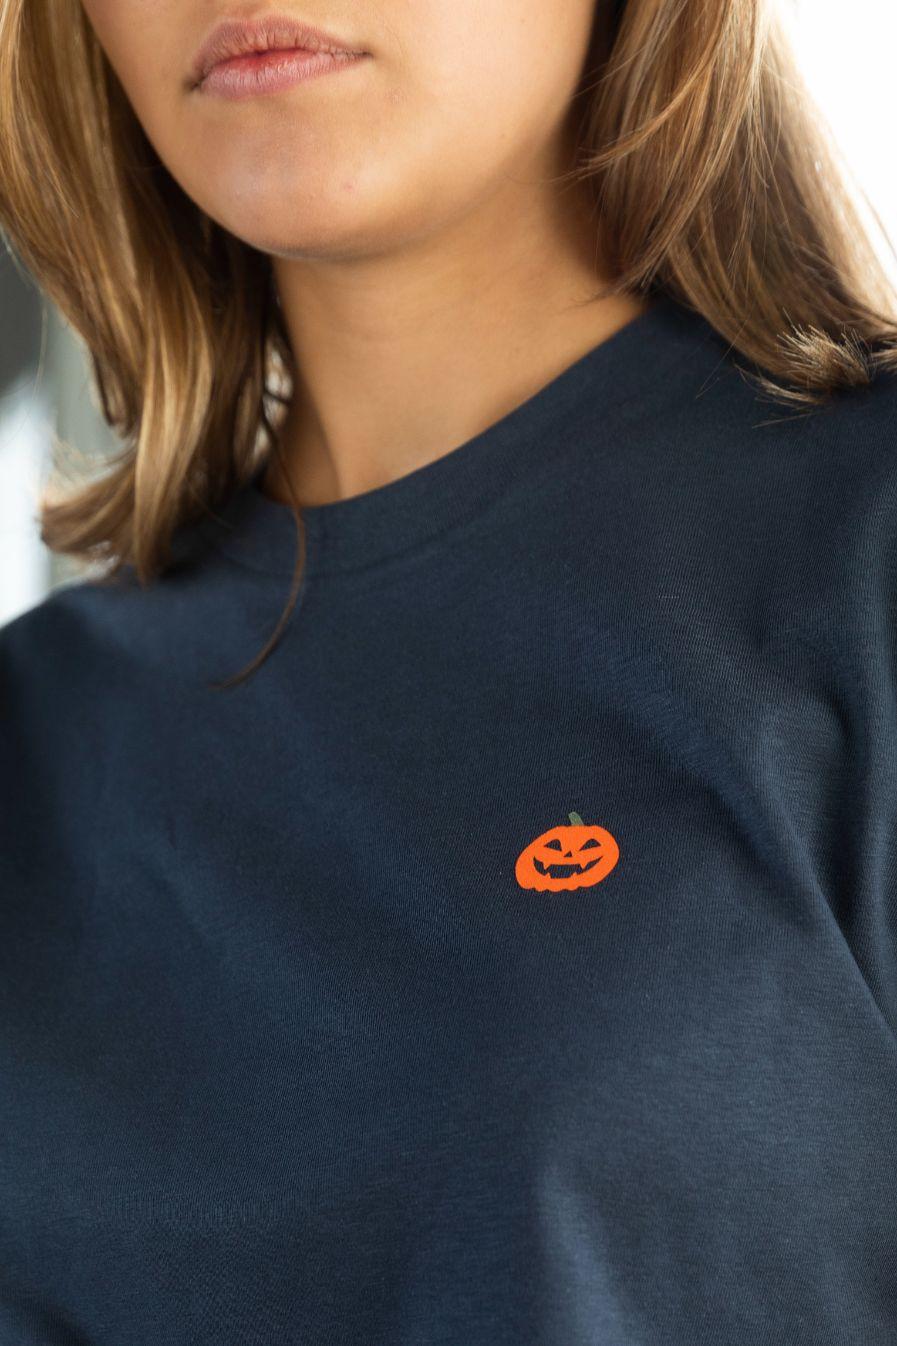 STRØM - T-shirt India Ink - Pumpkin